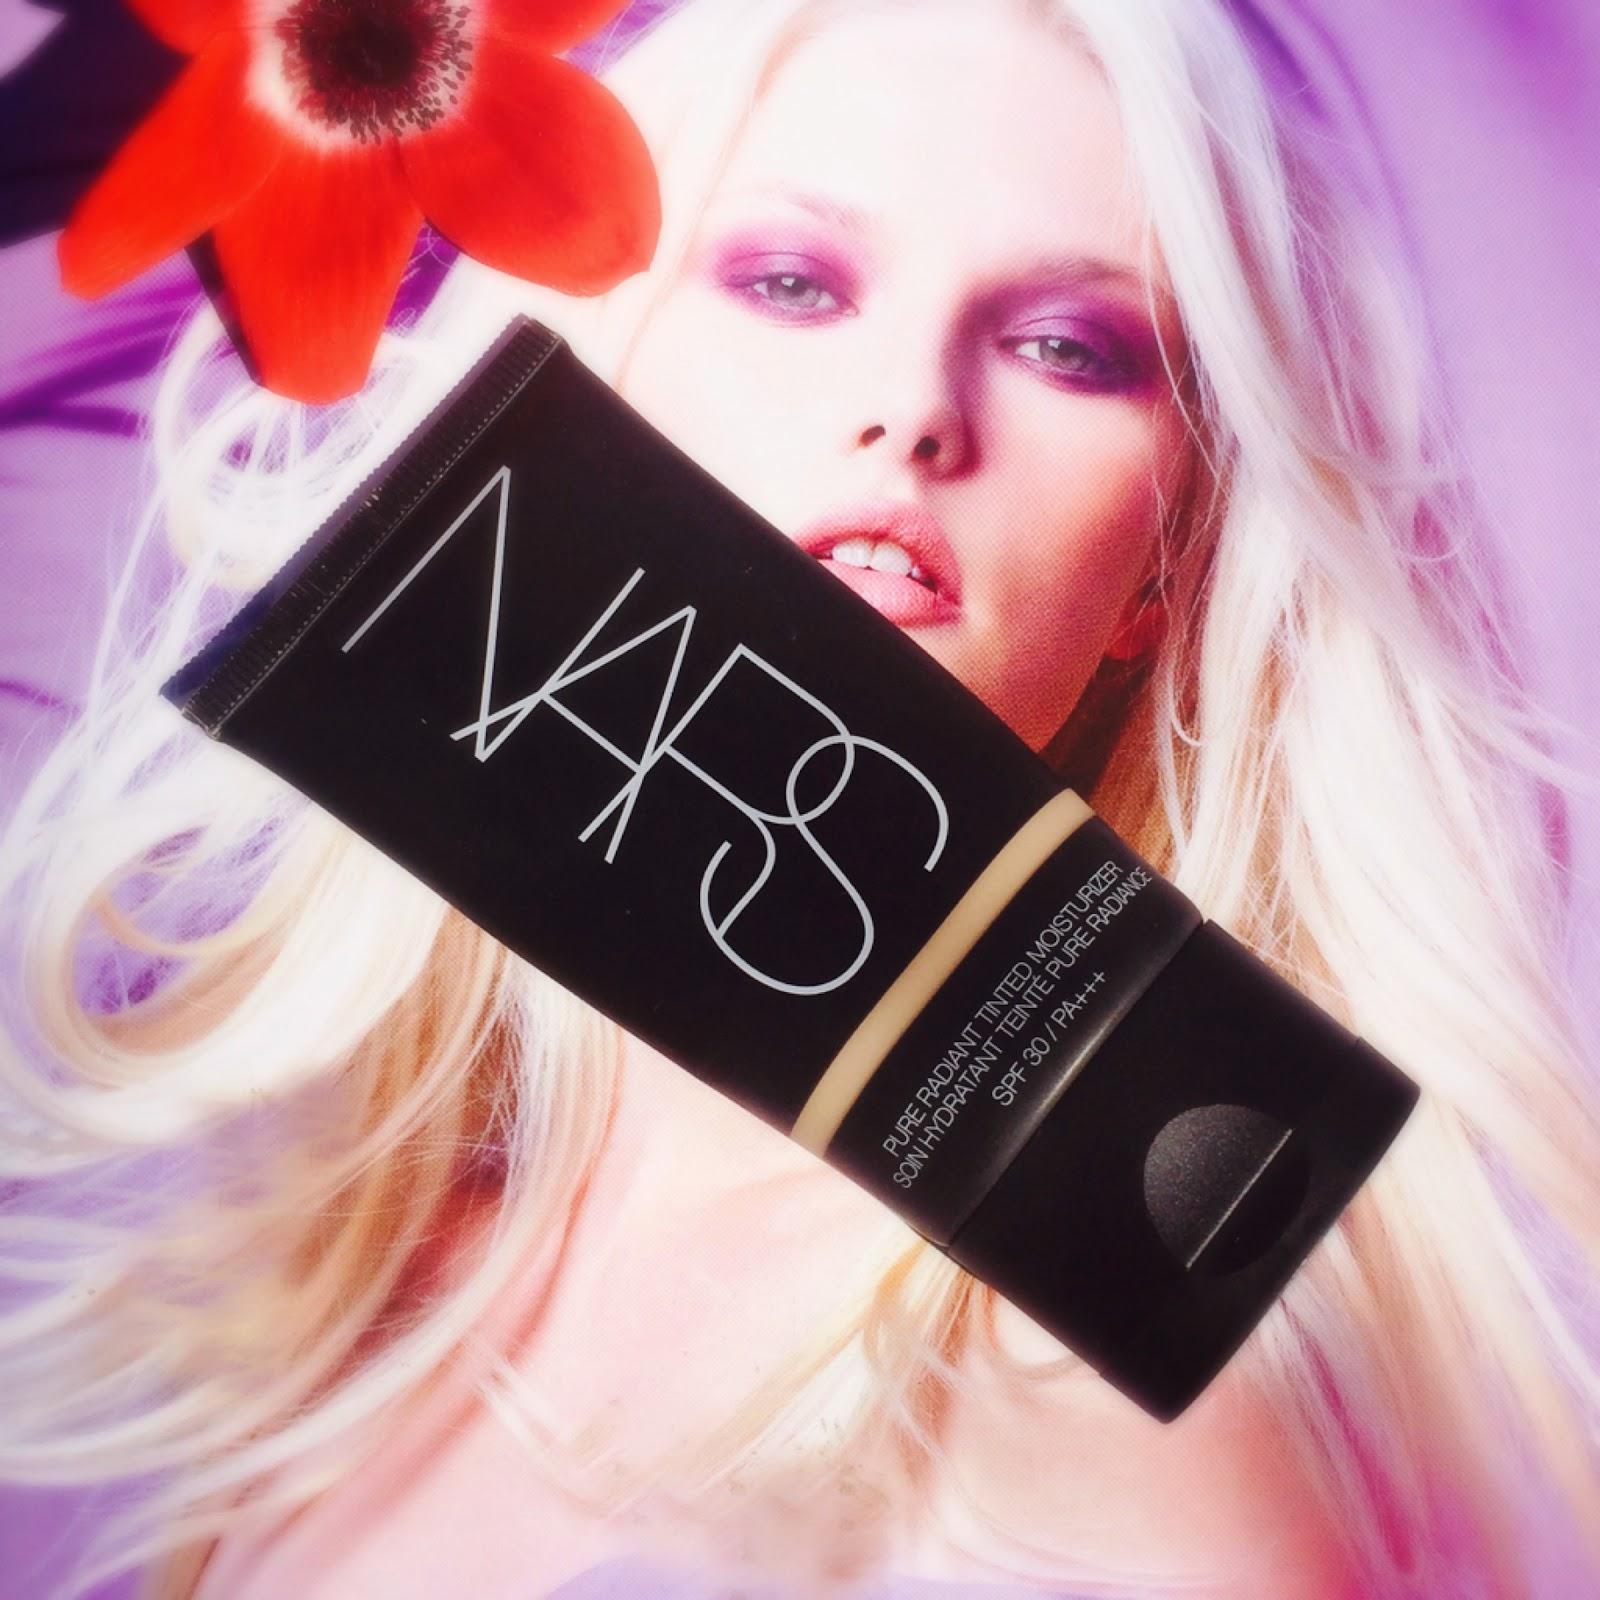 Nars Pure Radiance Tinted Moisturiser SPF 30 PA +++